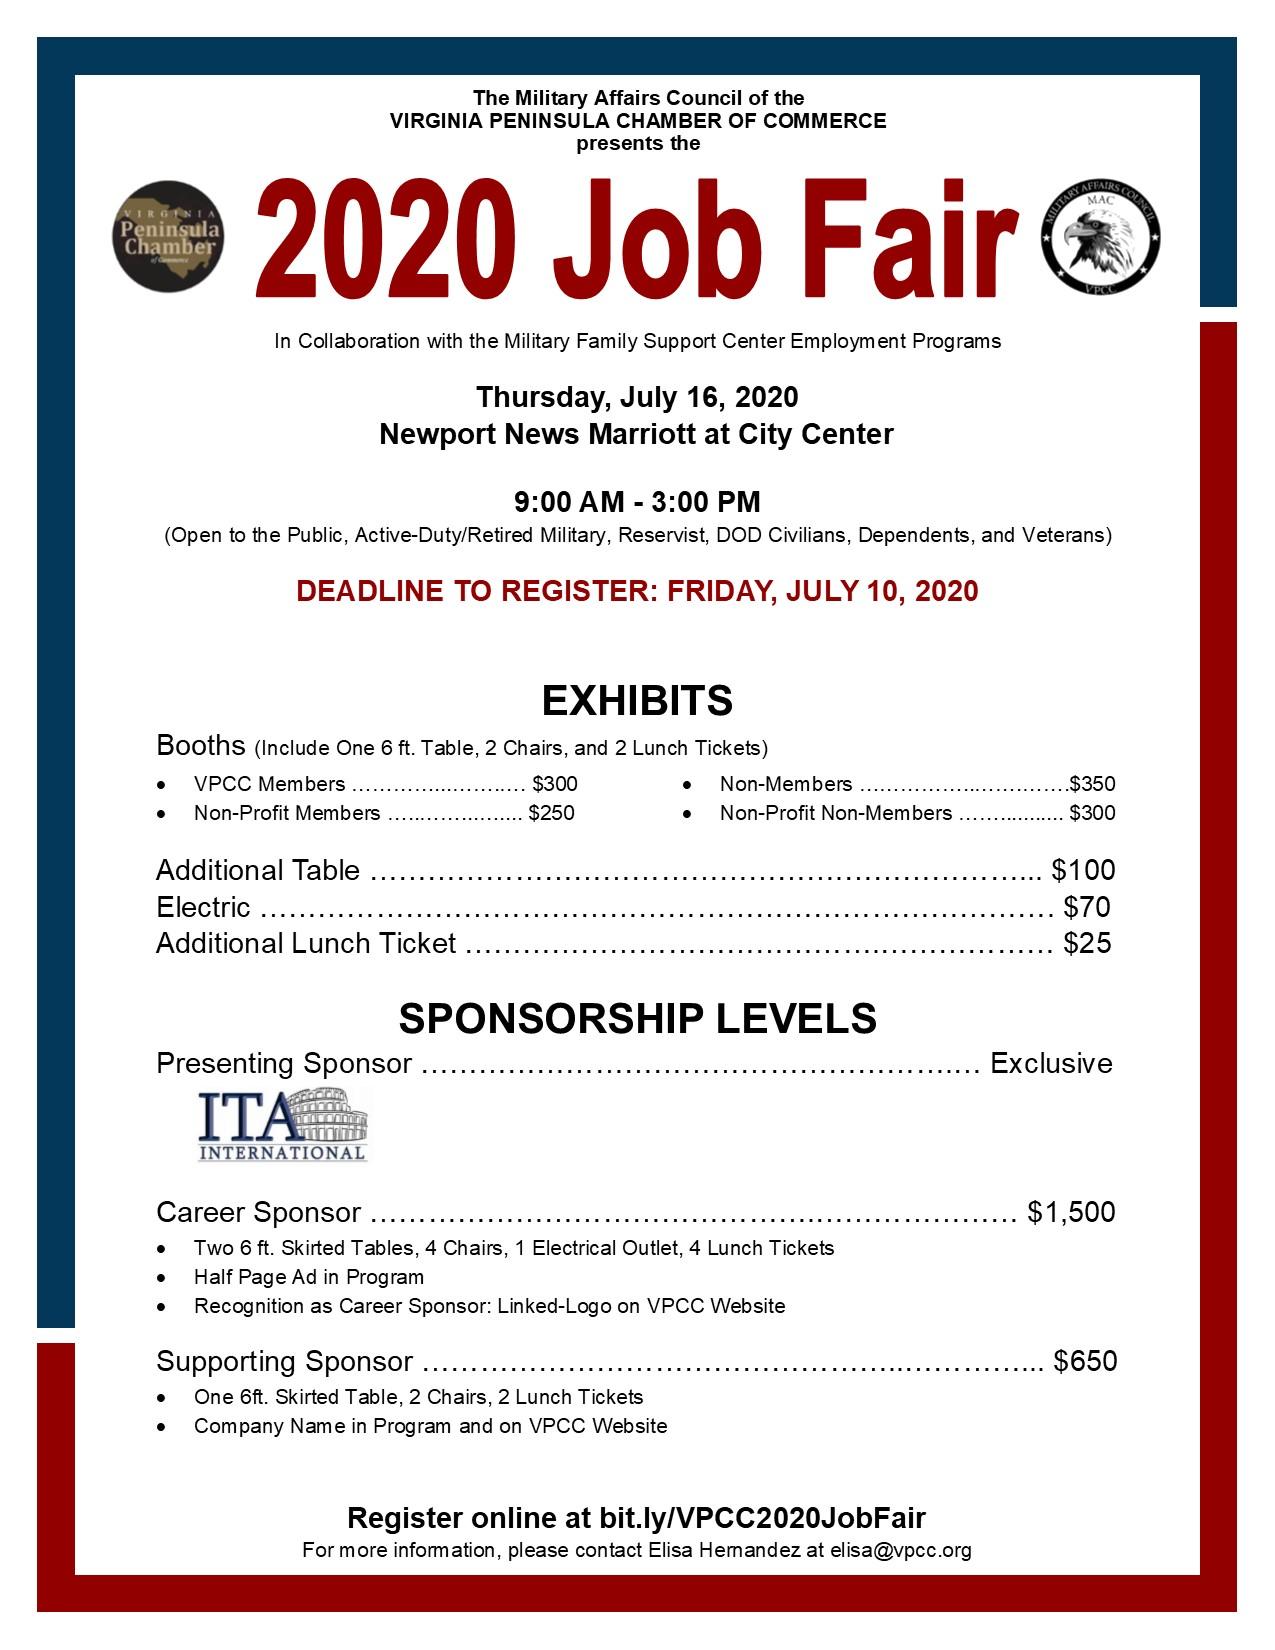 2018-Career-Fair-(SPONSORSHIP-and-EXHIBITOR-FLYER---EDITED-0518).jpg